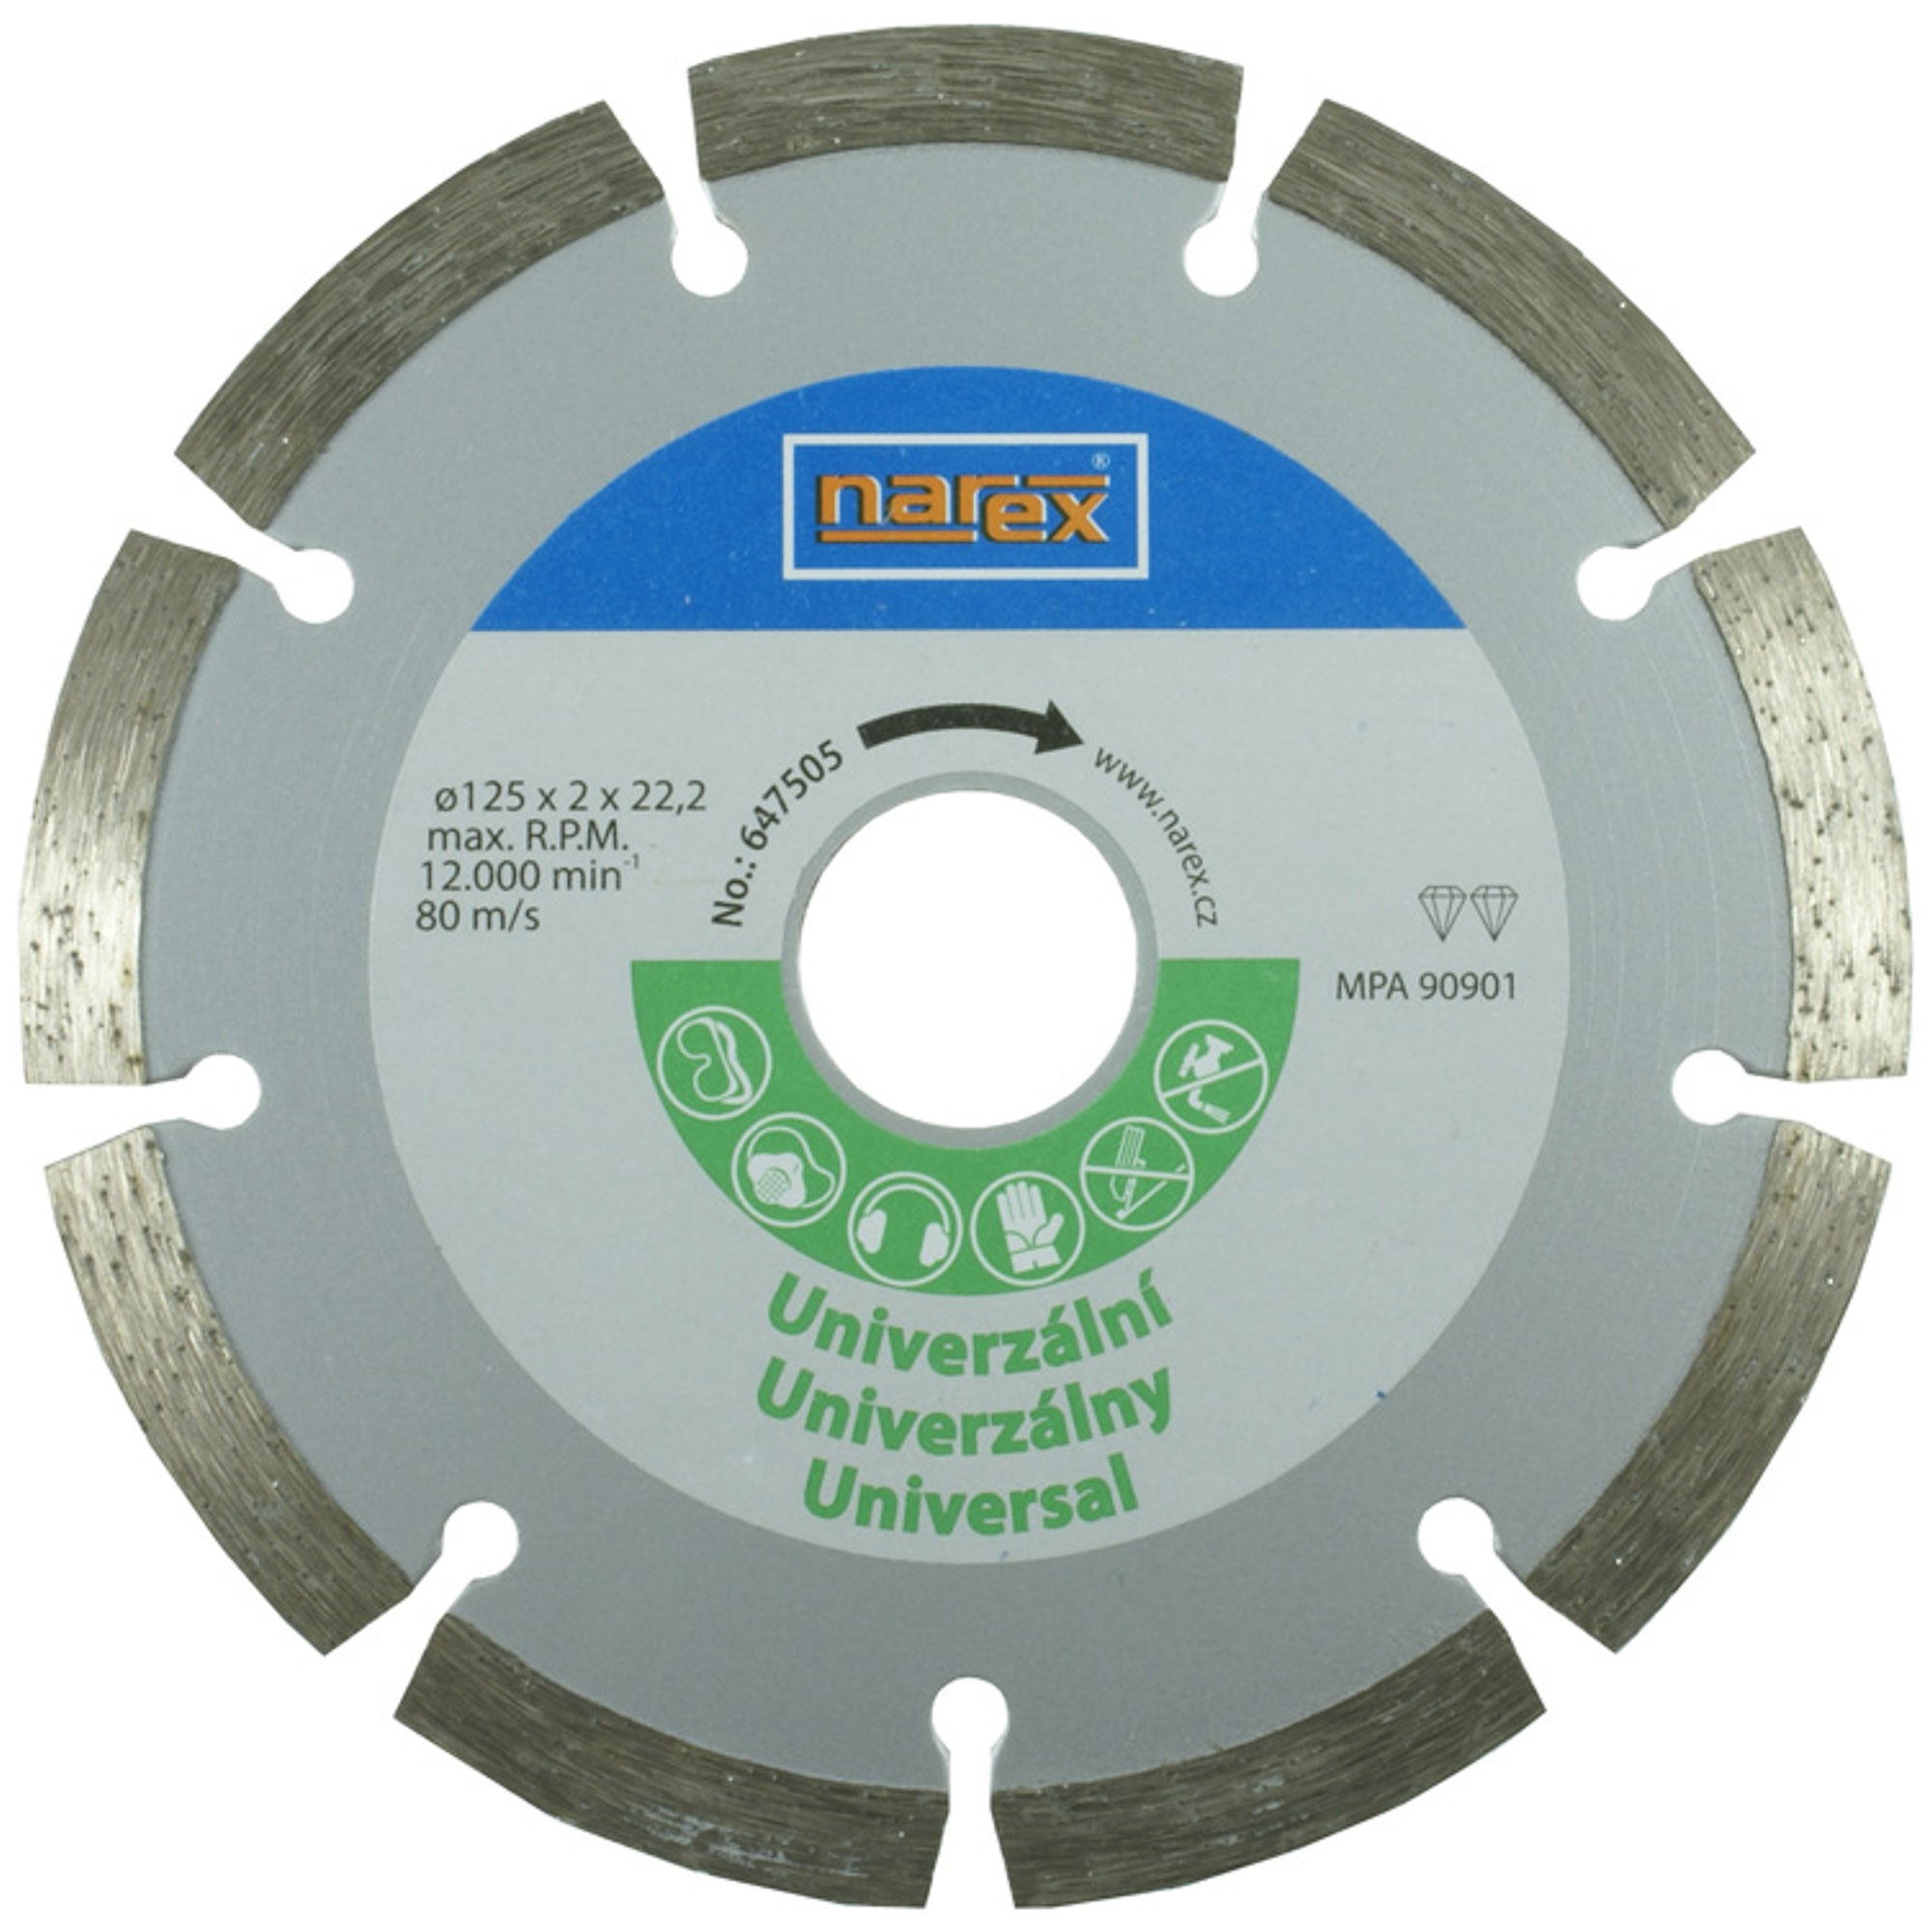 Narex Dia 125 Universal -...